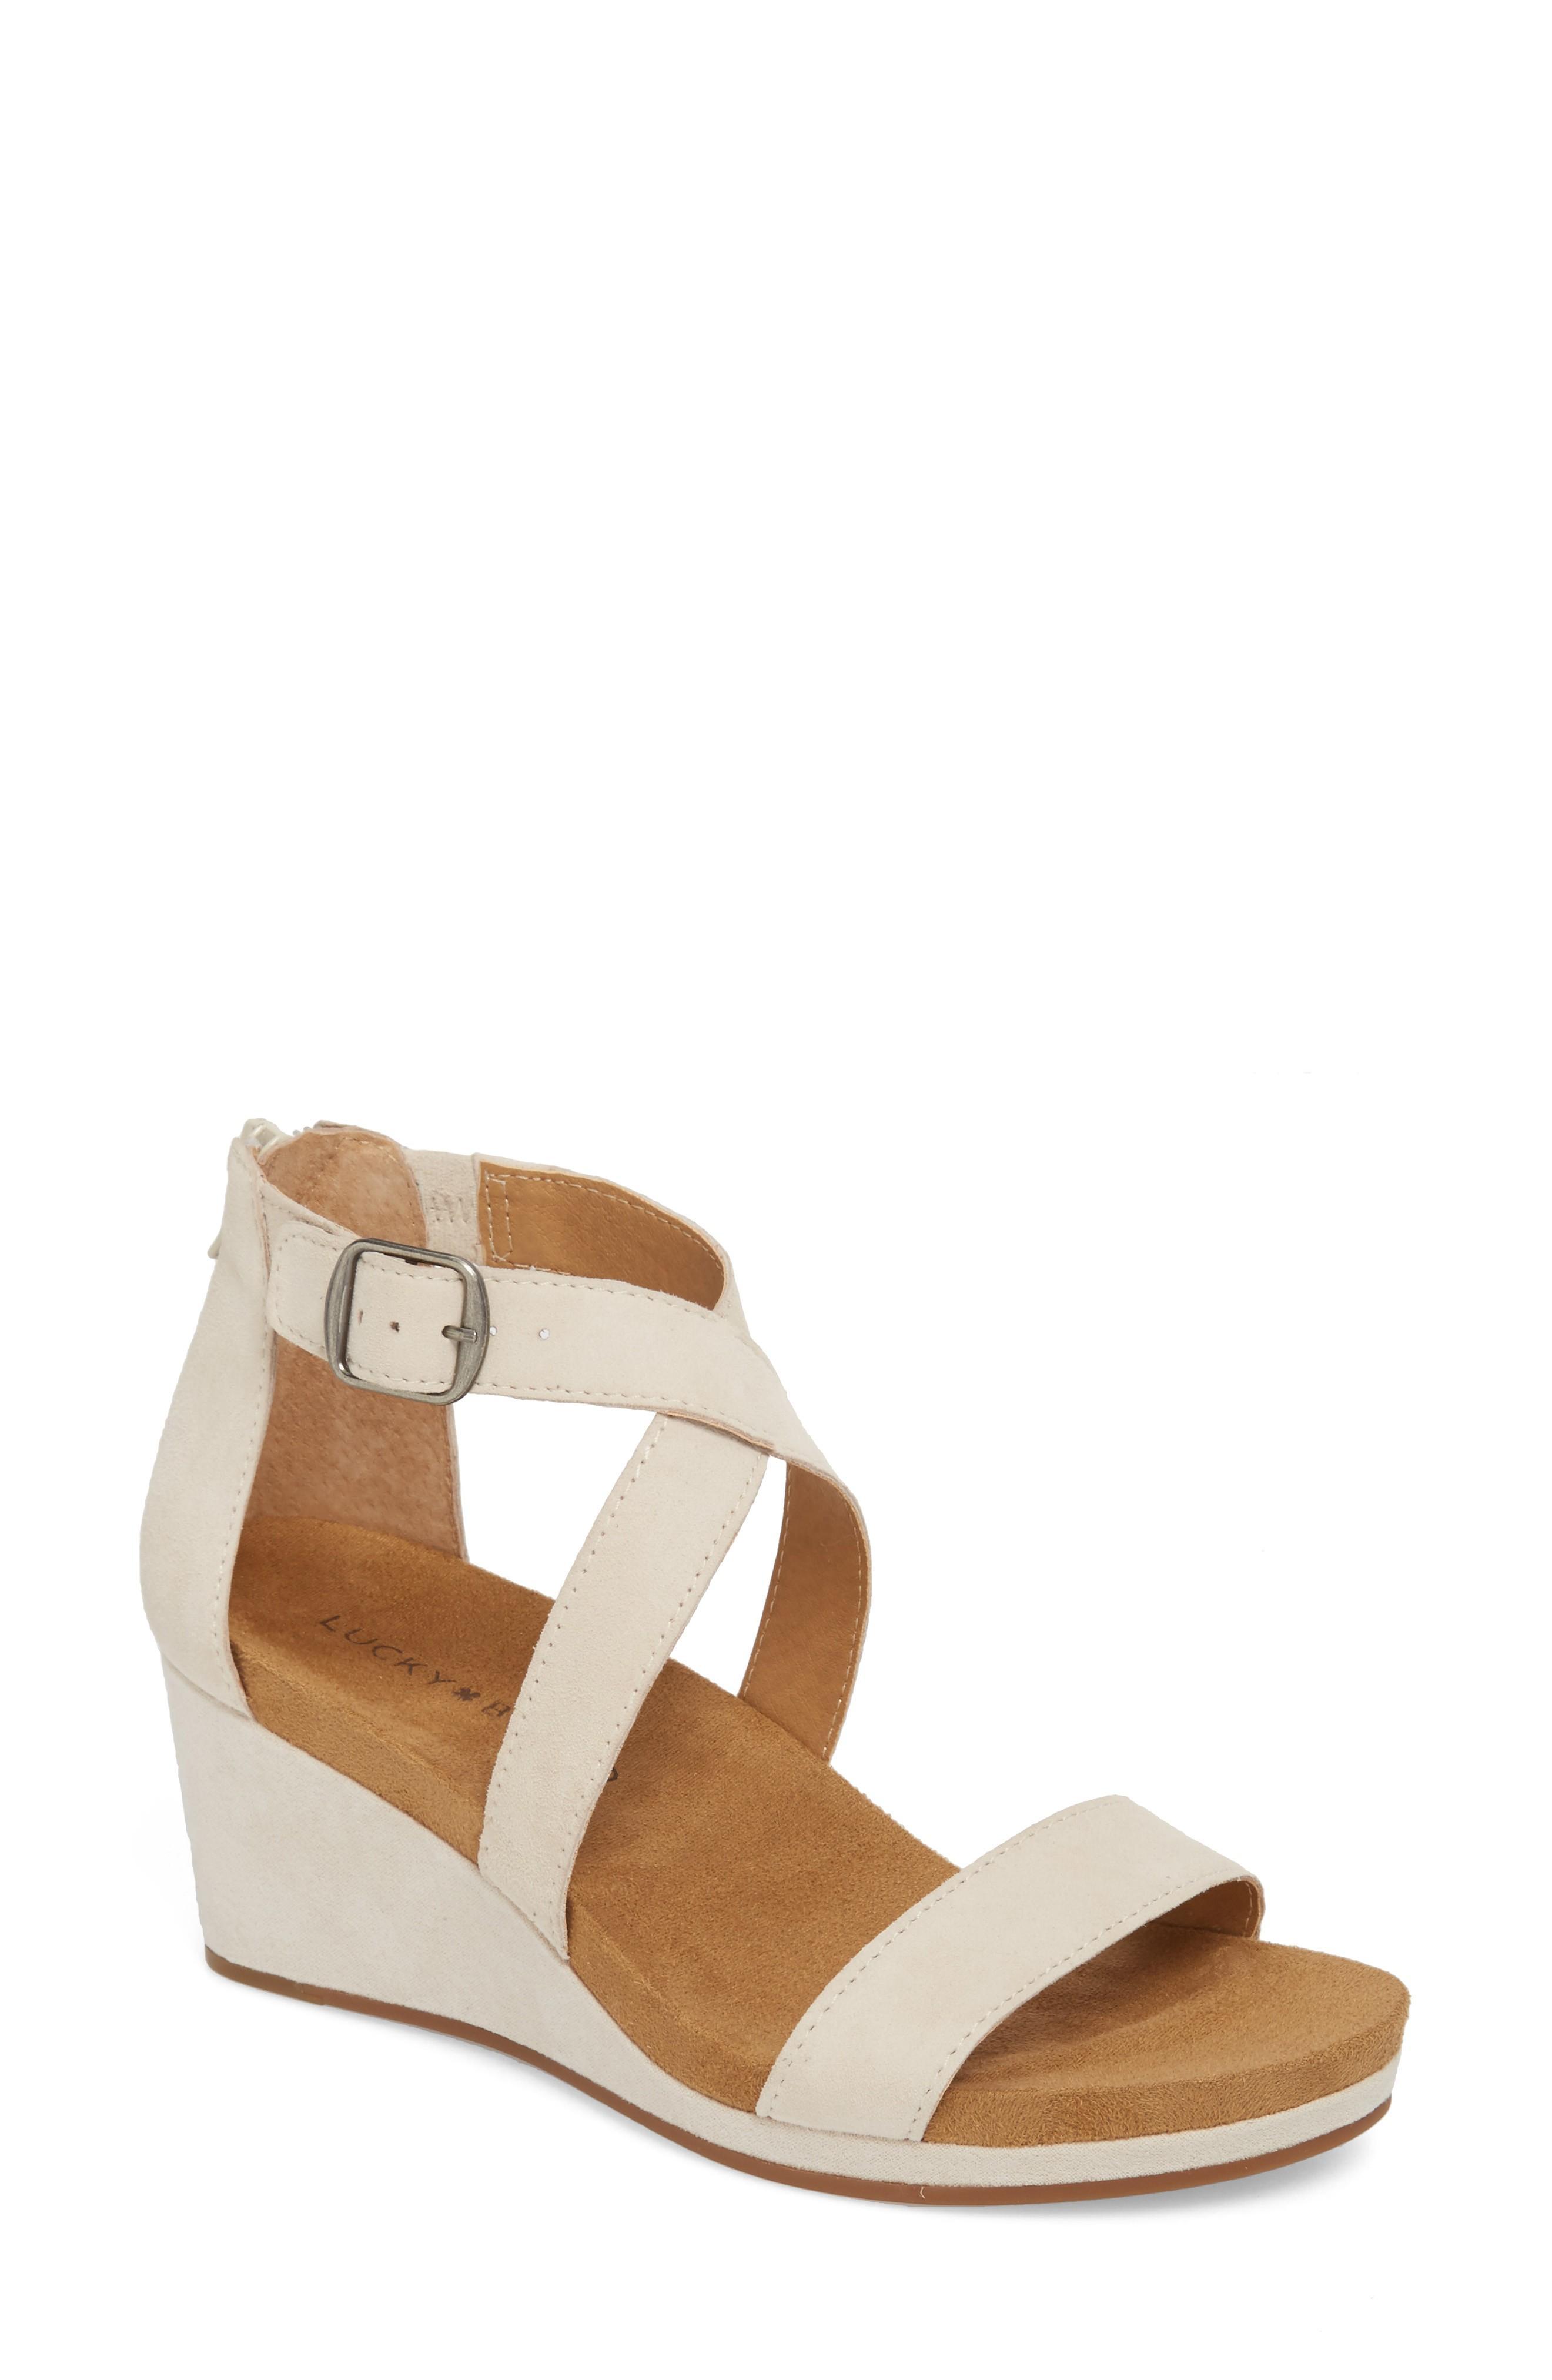 29bd82491b52 Lucky Brand Kenadee Wedge Sandal In Sandshell Suede